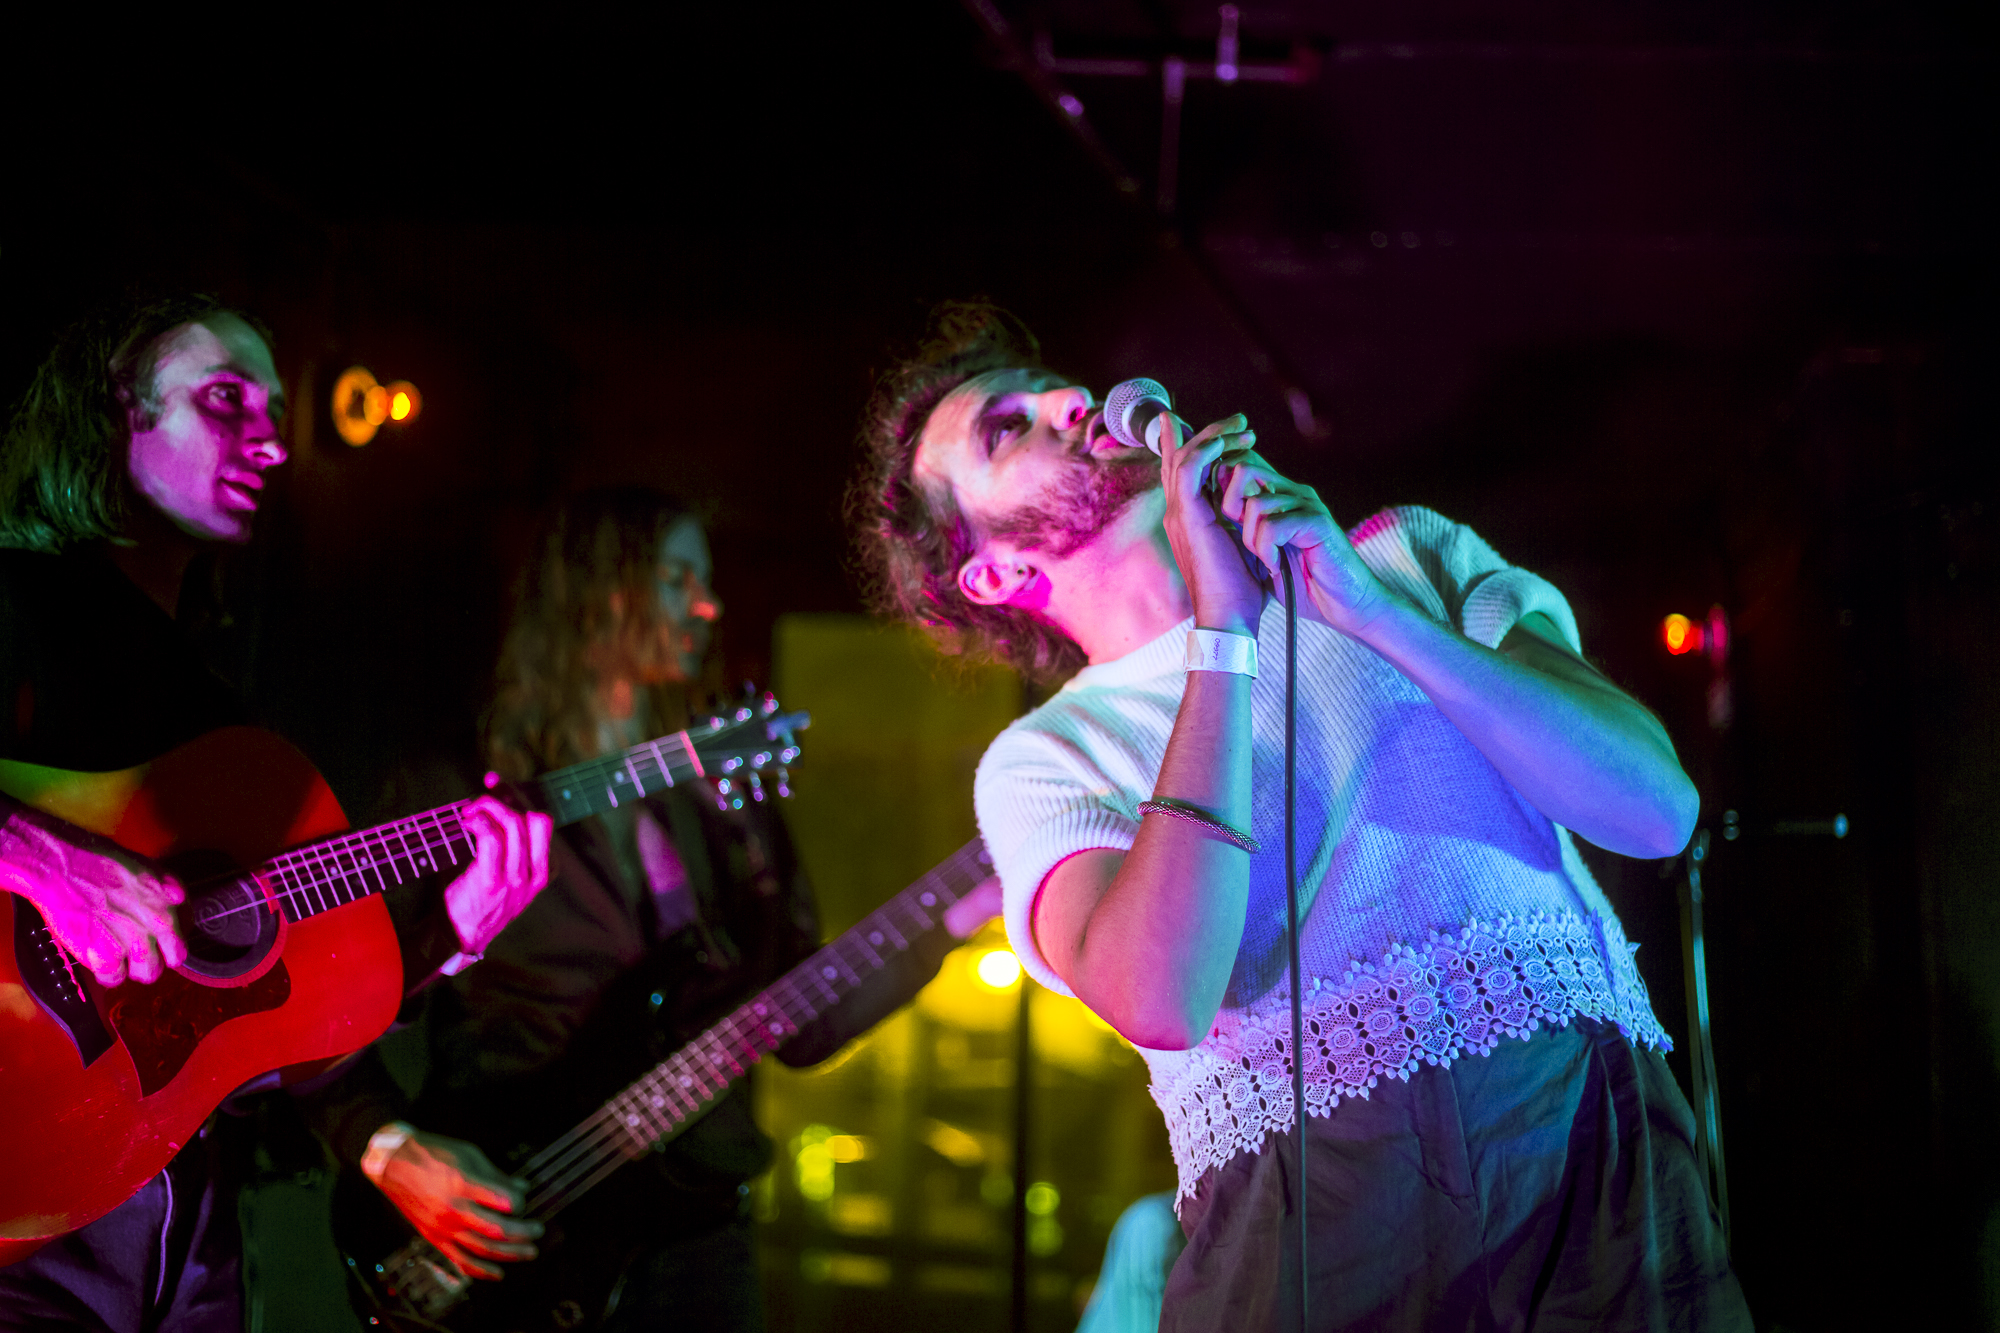 Drugdealer @ Market Hotel - Drugdealer put on an over the top release show for Raw Honey, Michael Collins' latest psychedelic pop album.